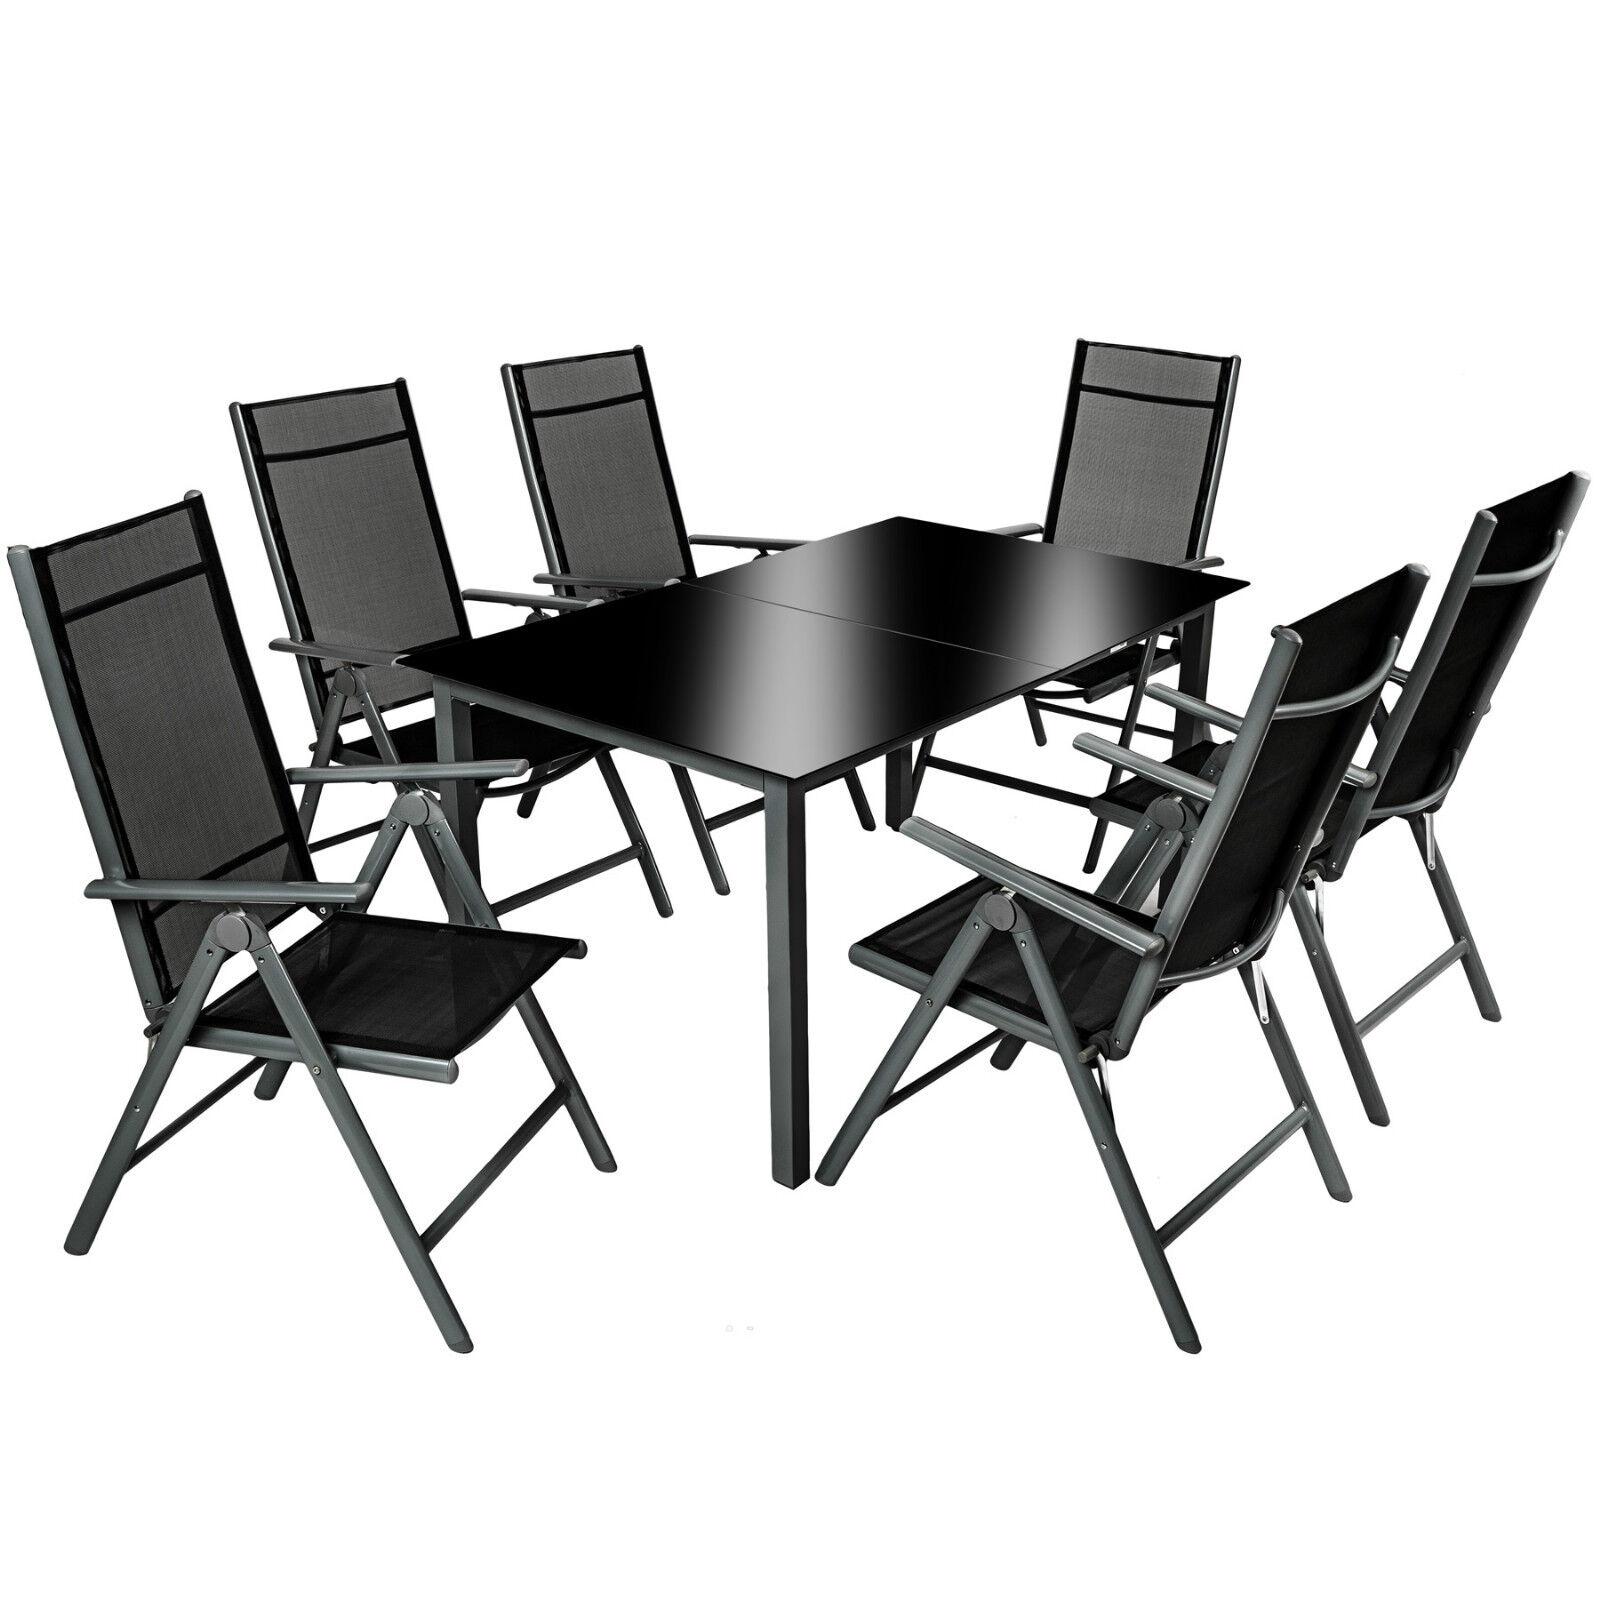 Alu Sitzgruppe 6+1 Gartenmöbel Gartengarnitur Tisch Stuhl Essgruppe B-Ware